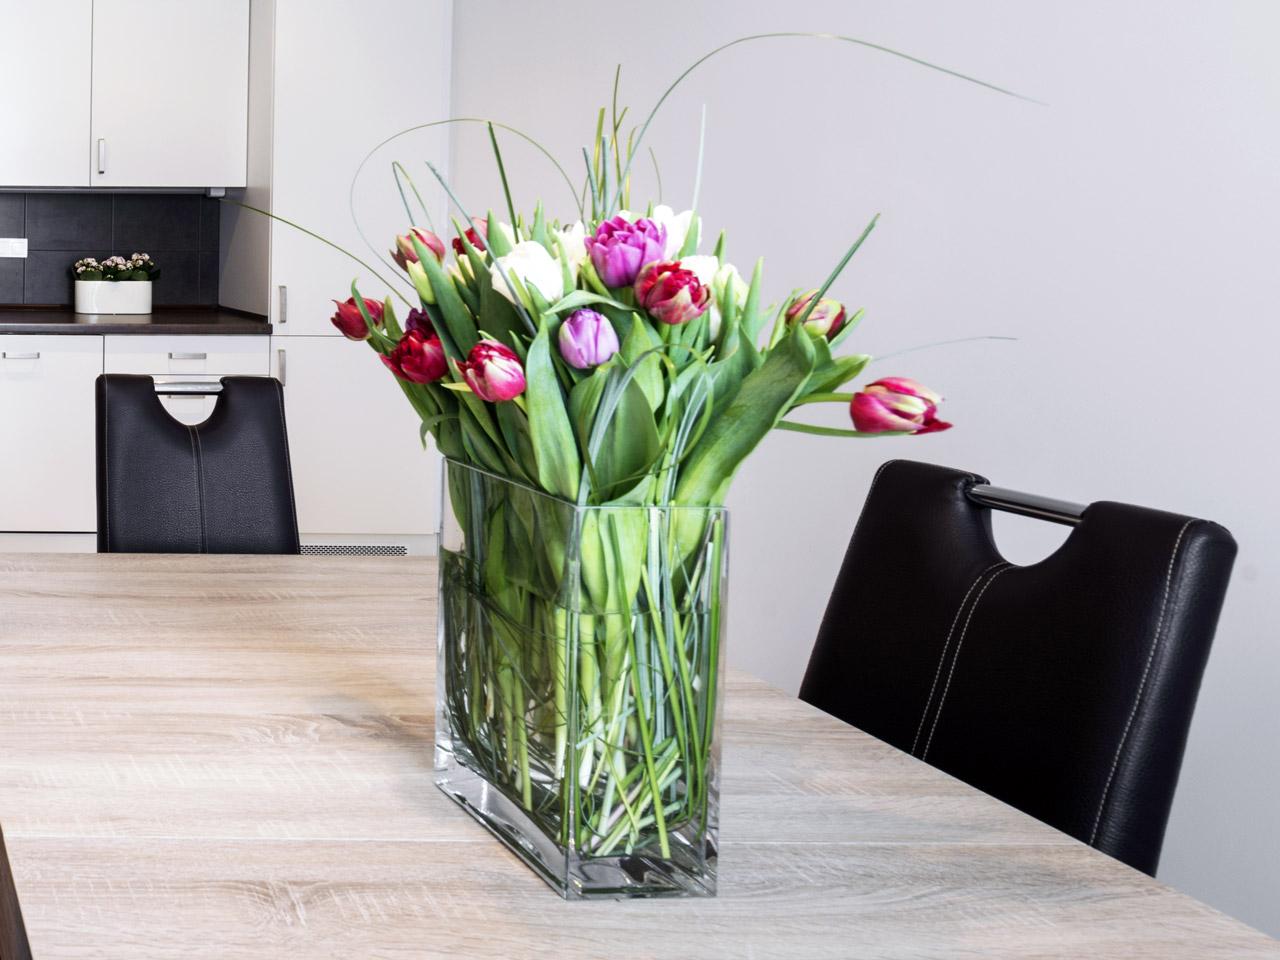 Rechteckig Vase mit Tulpen als Osterdeko